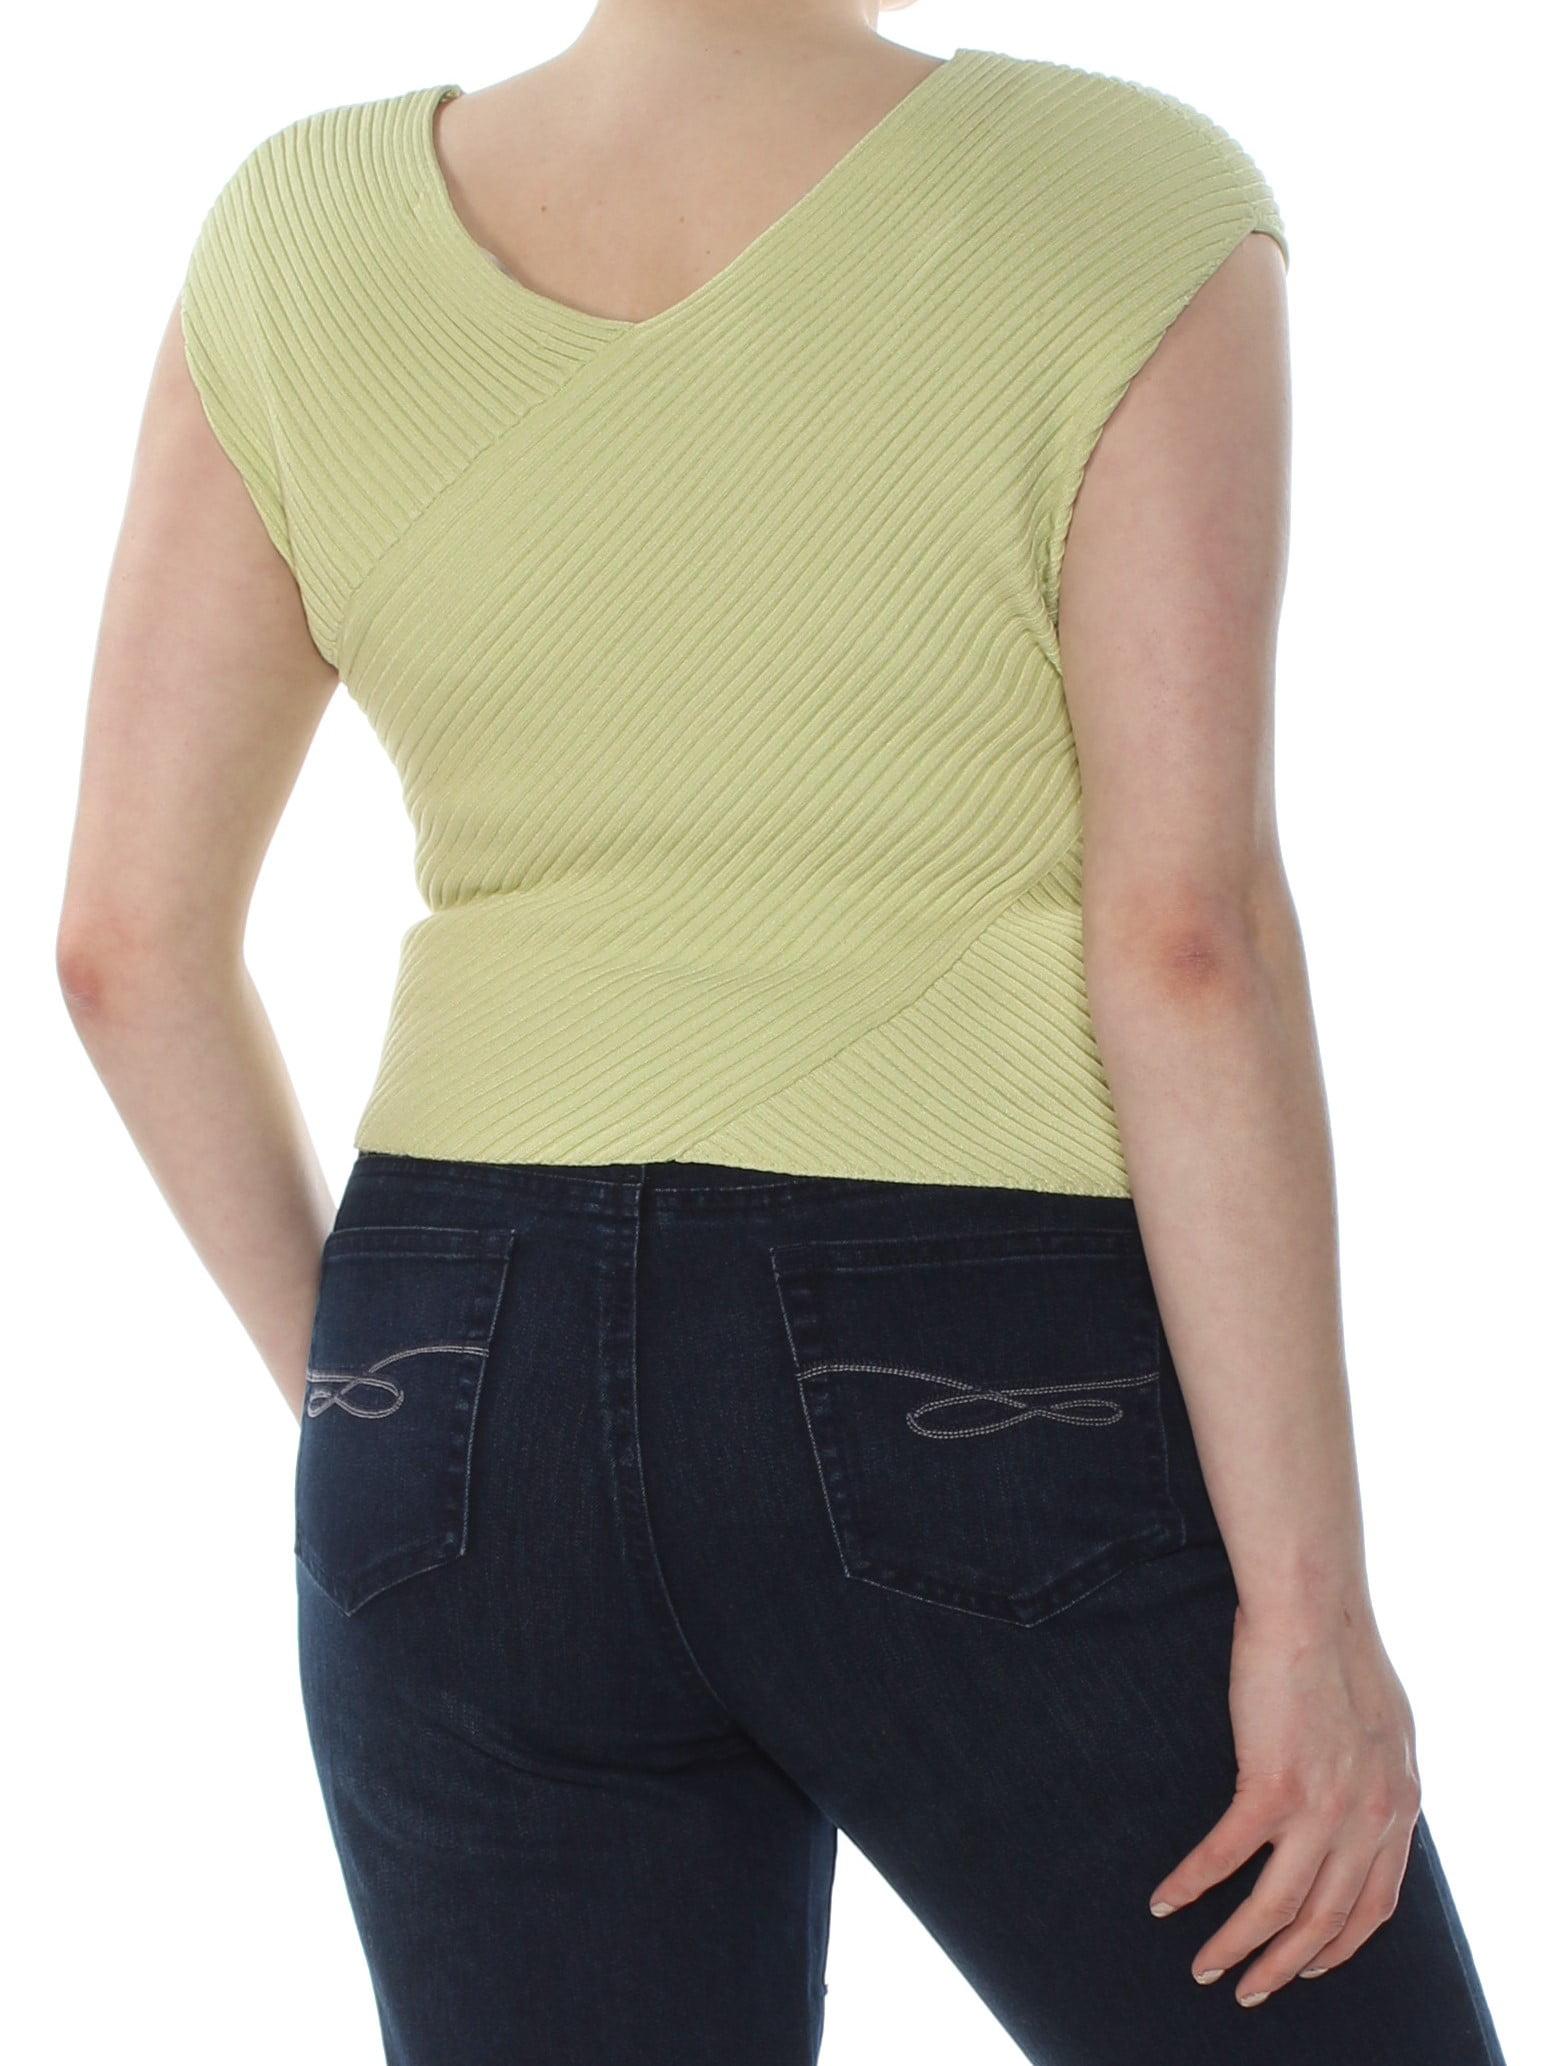 RACHEL Rachel Roy Womens Ribbed Trim Sleeveless Crop Top